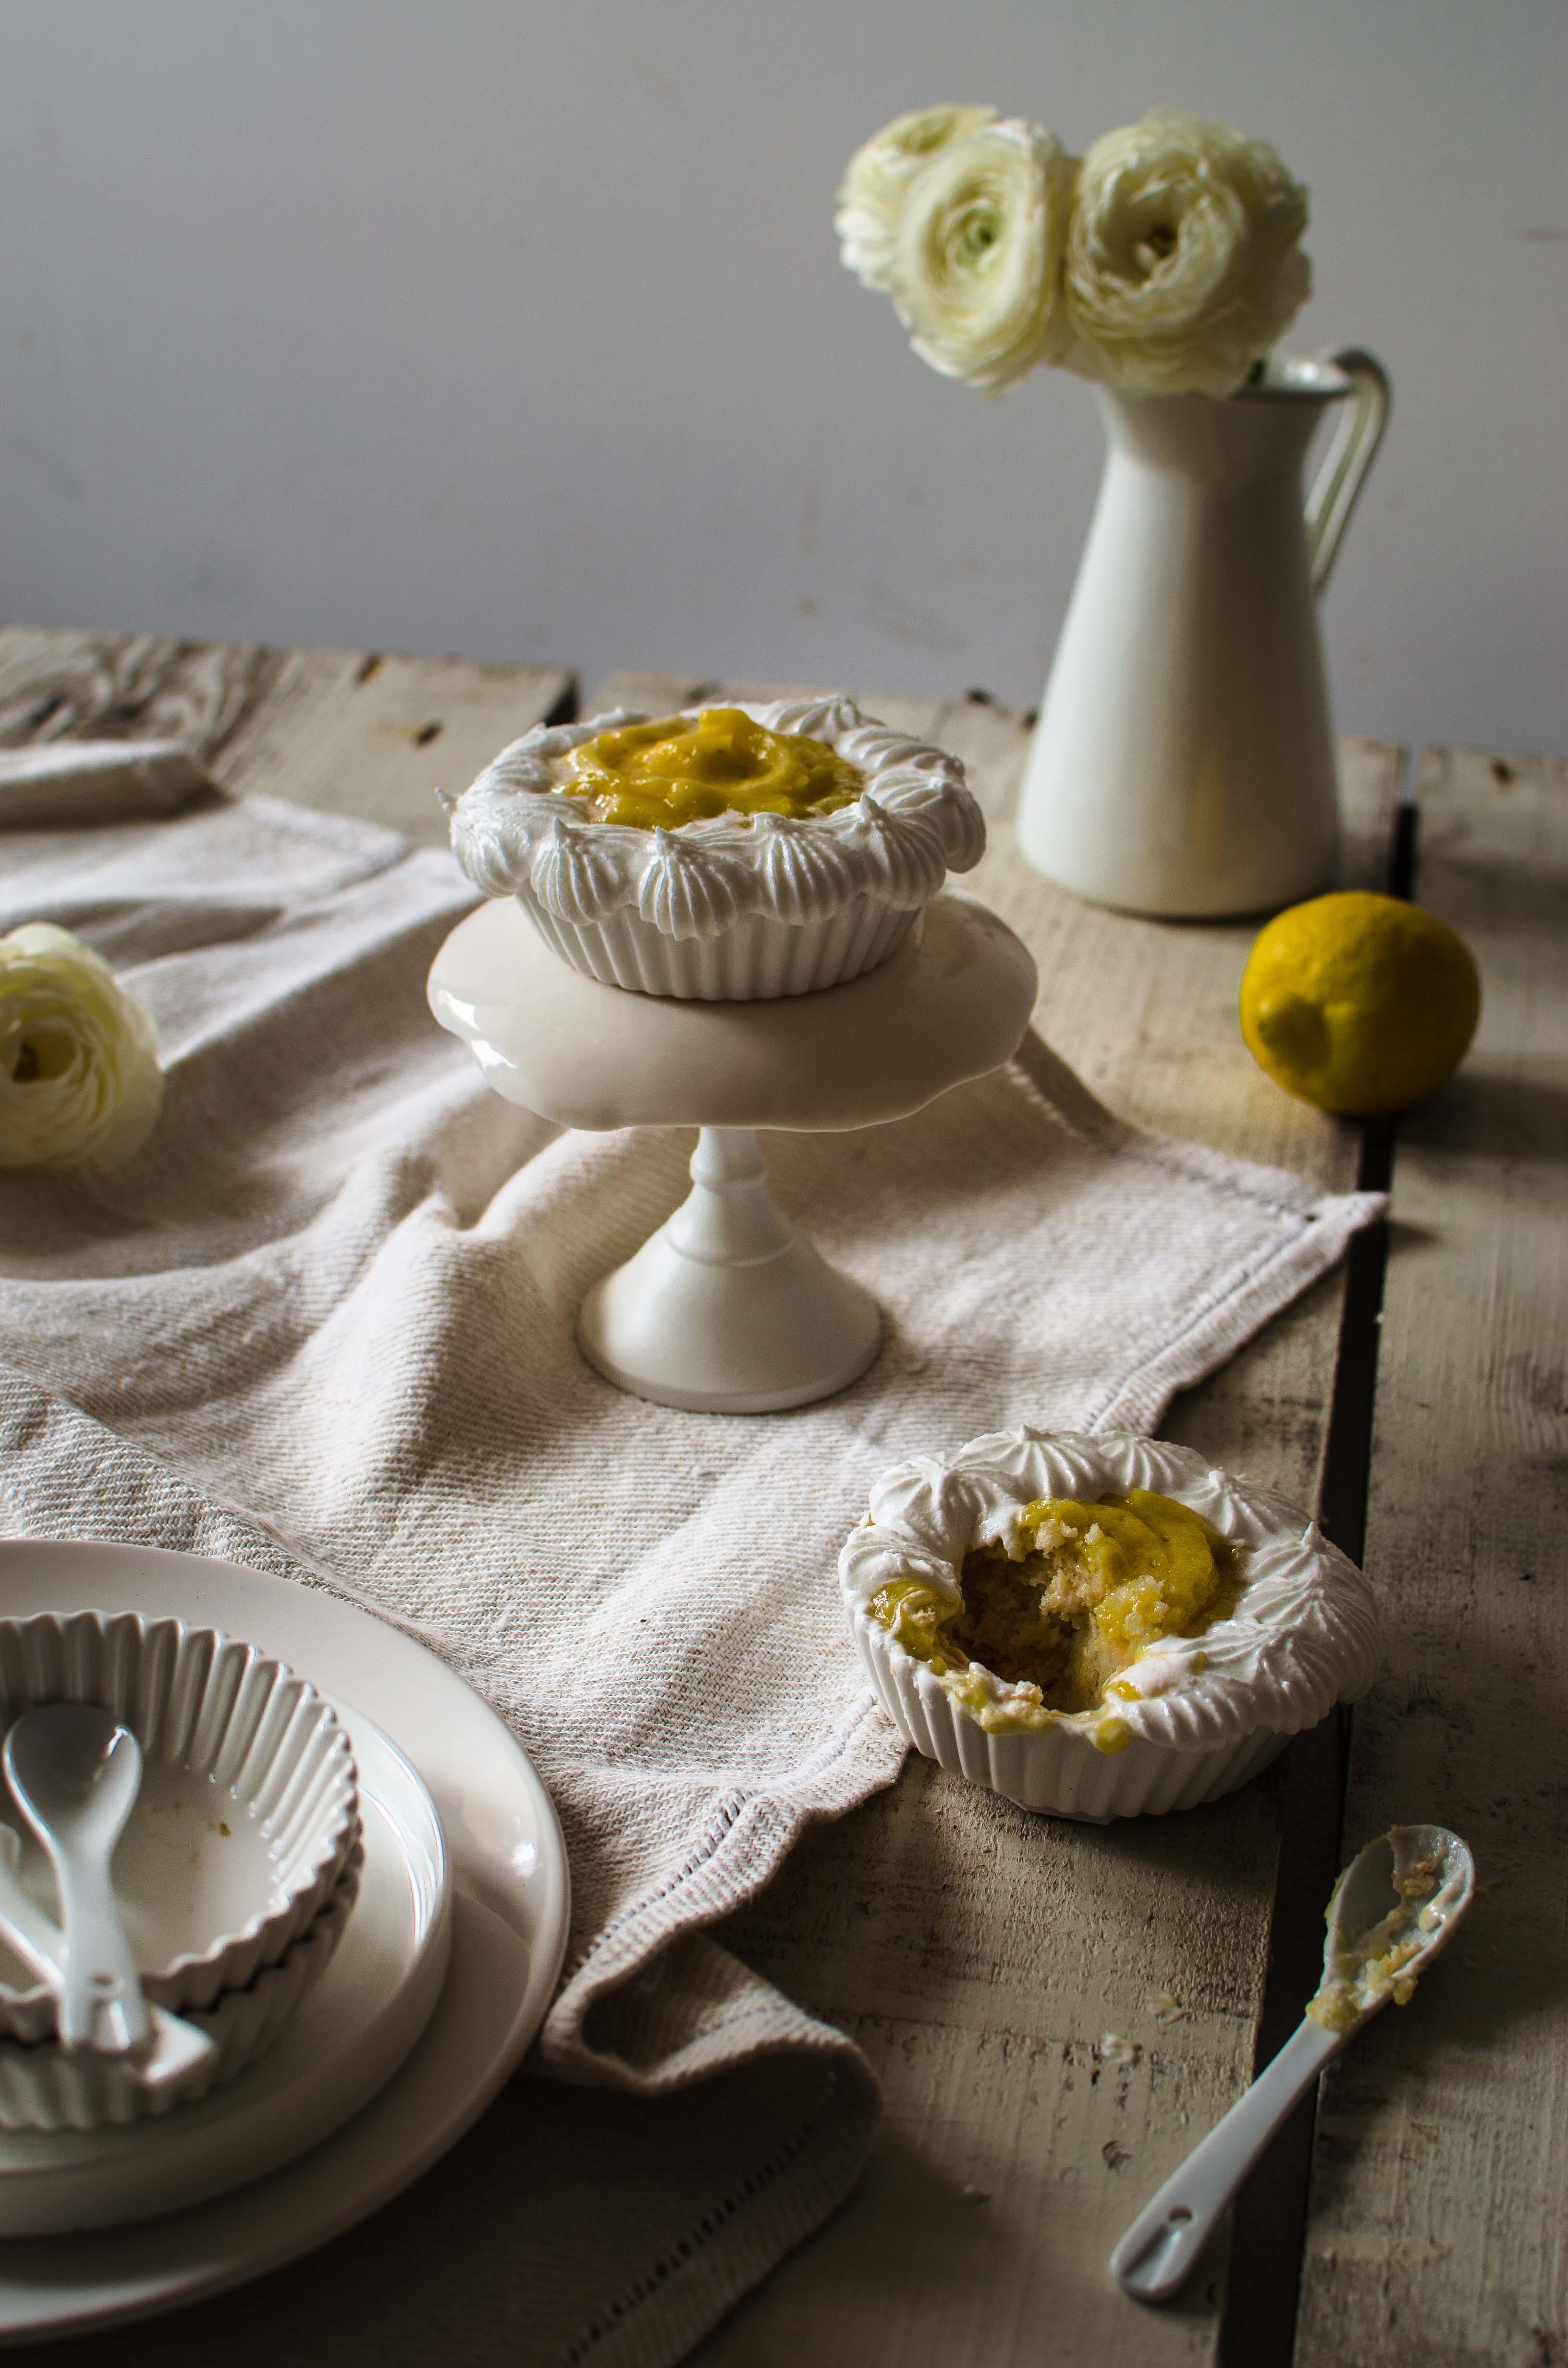 meringa_limone Financiers alle mandorle, crema al limone e meringa